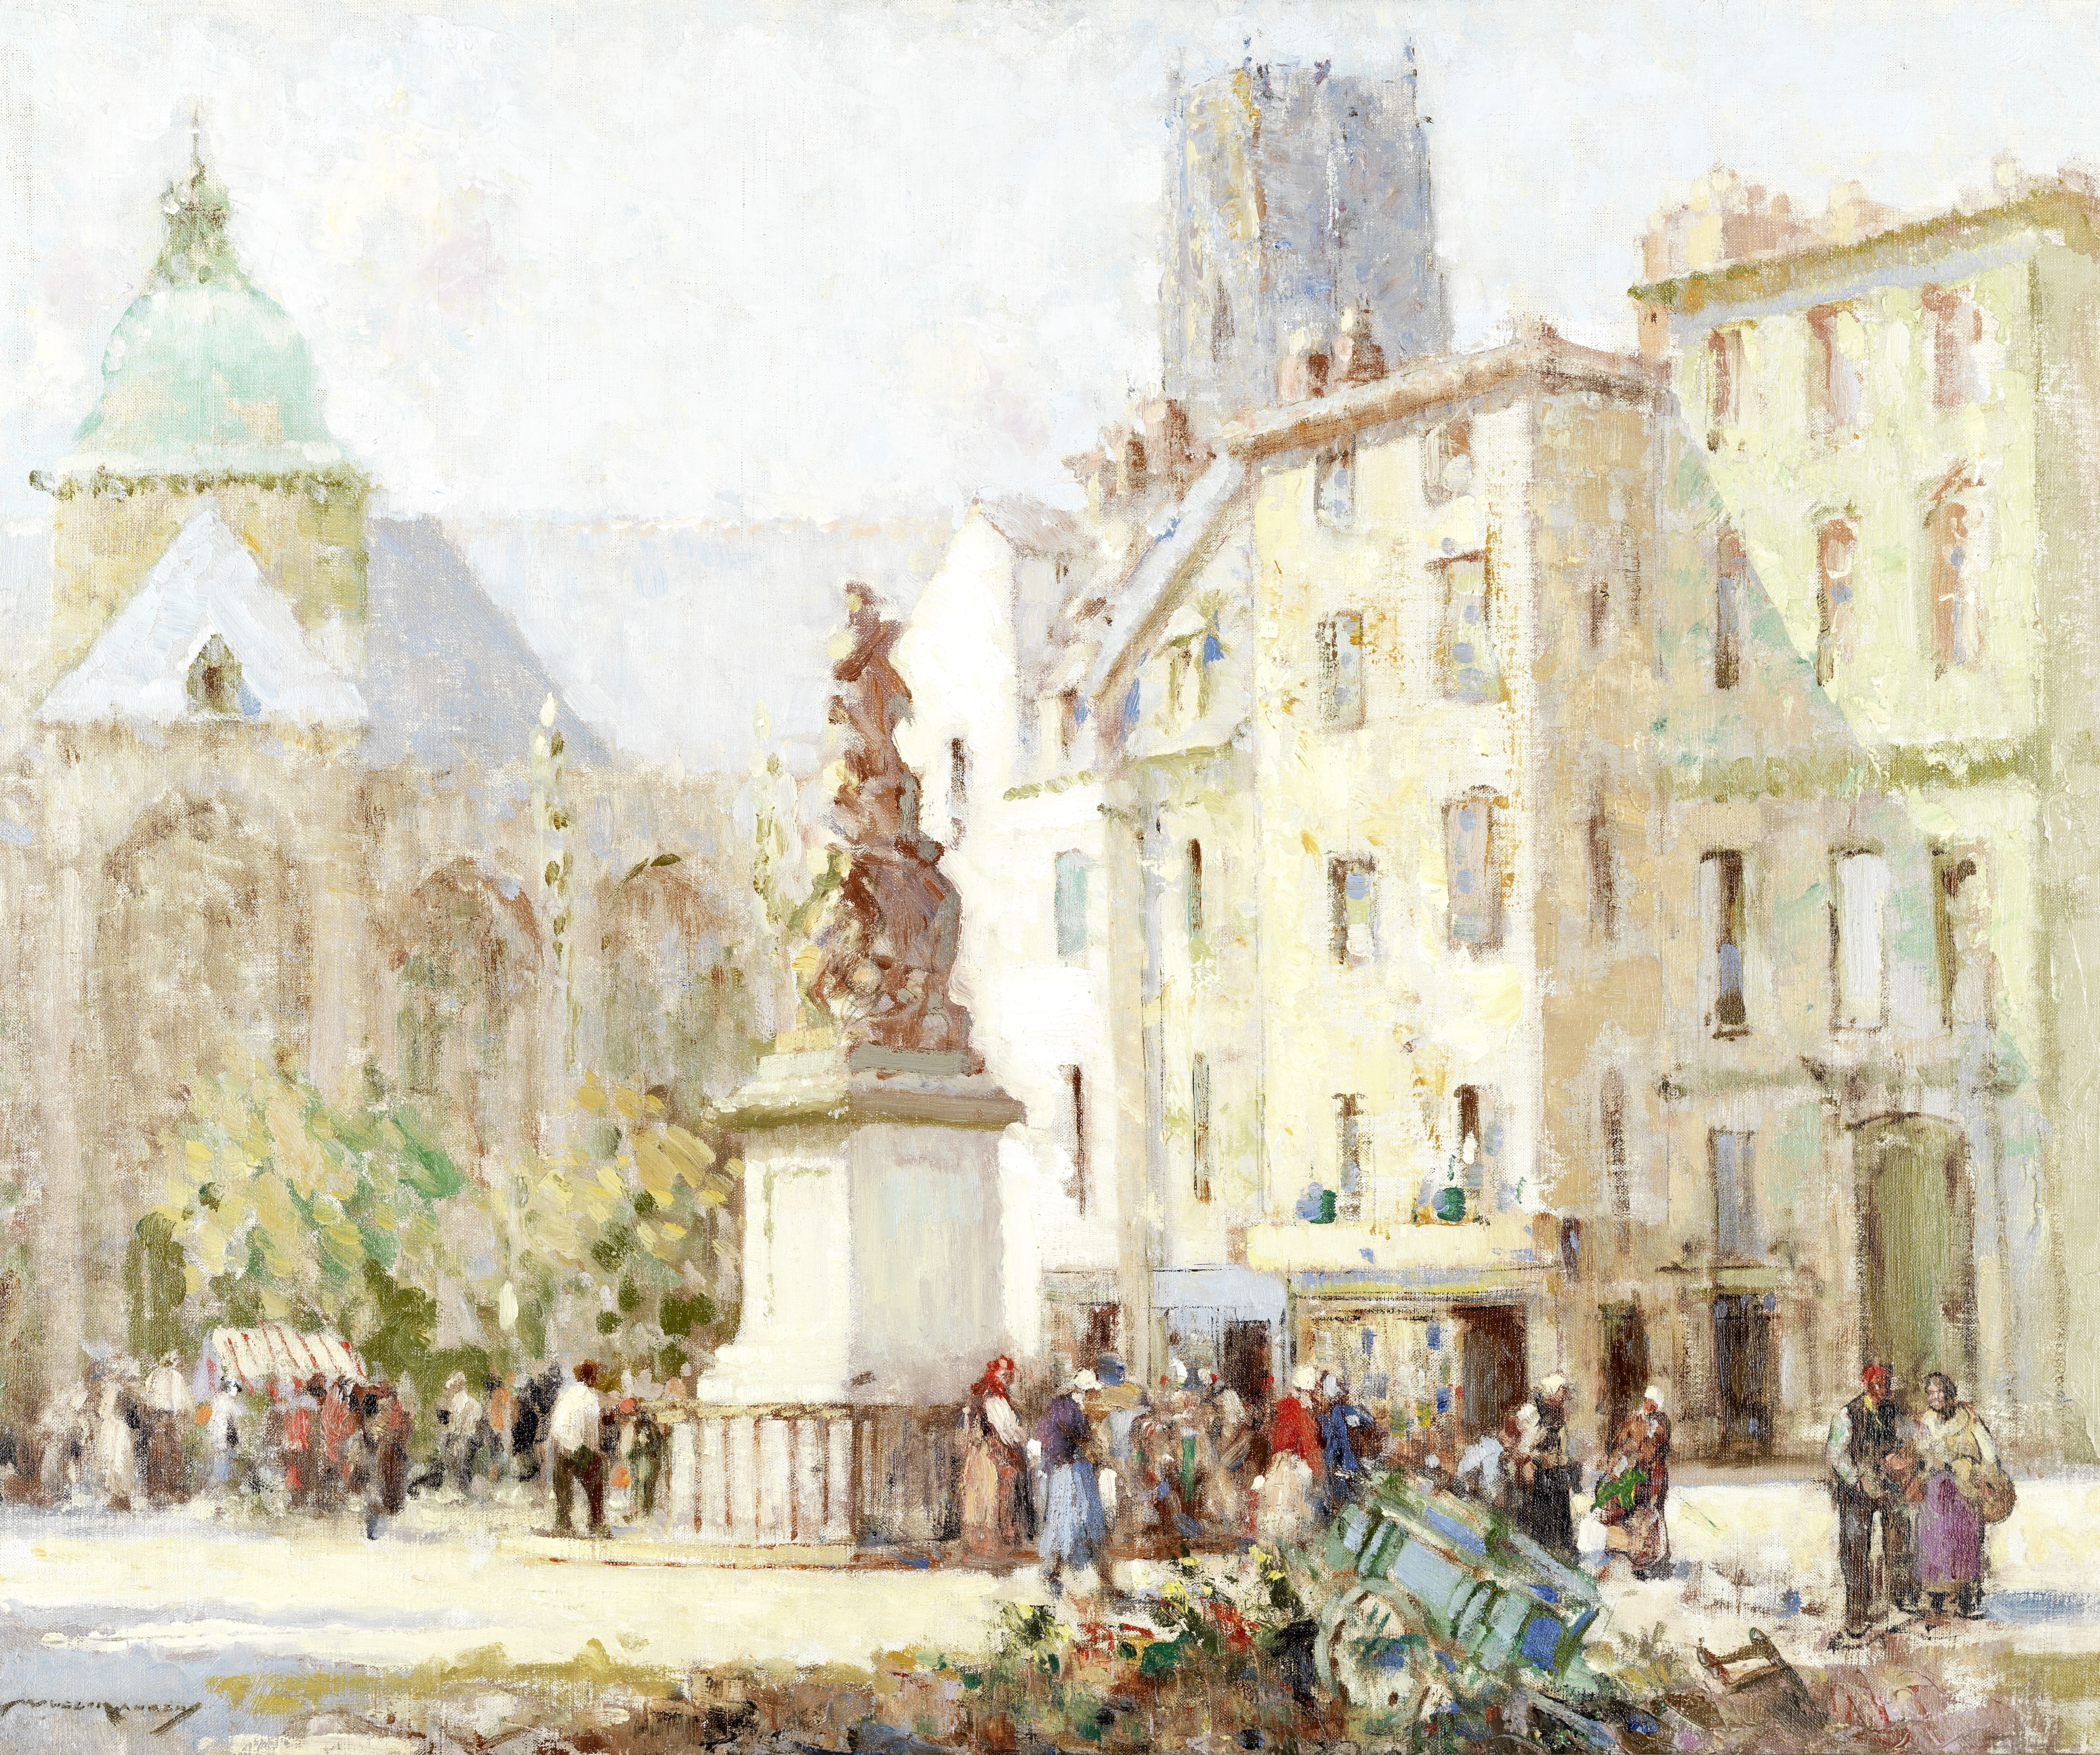 William Lee Hankey RWS, RI, ROI, RE (British, 1869-1952) The market, Dieppe